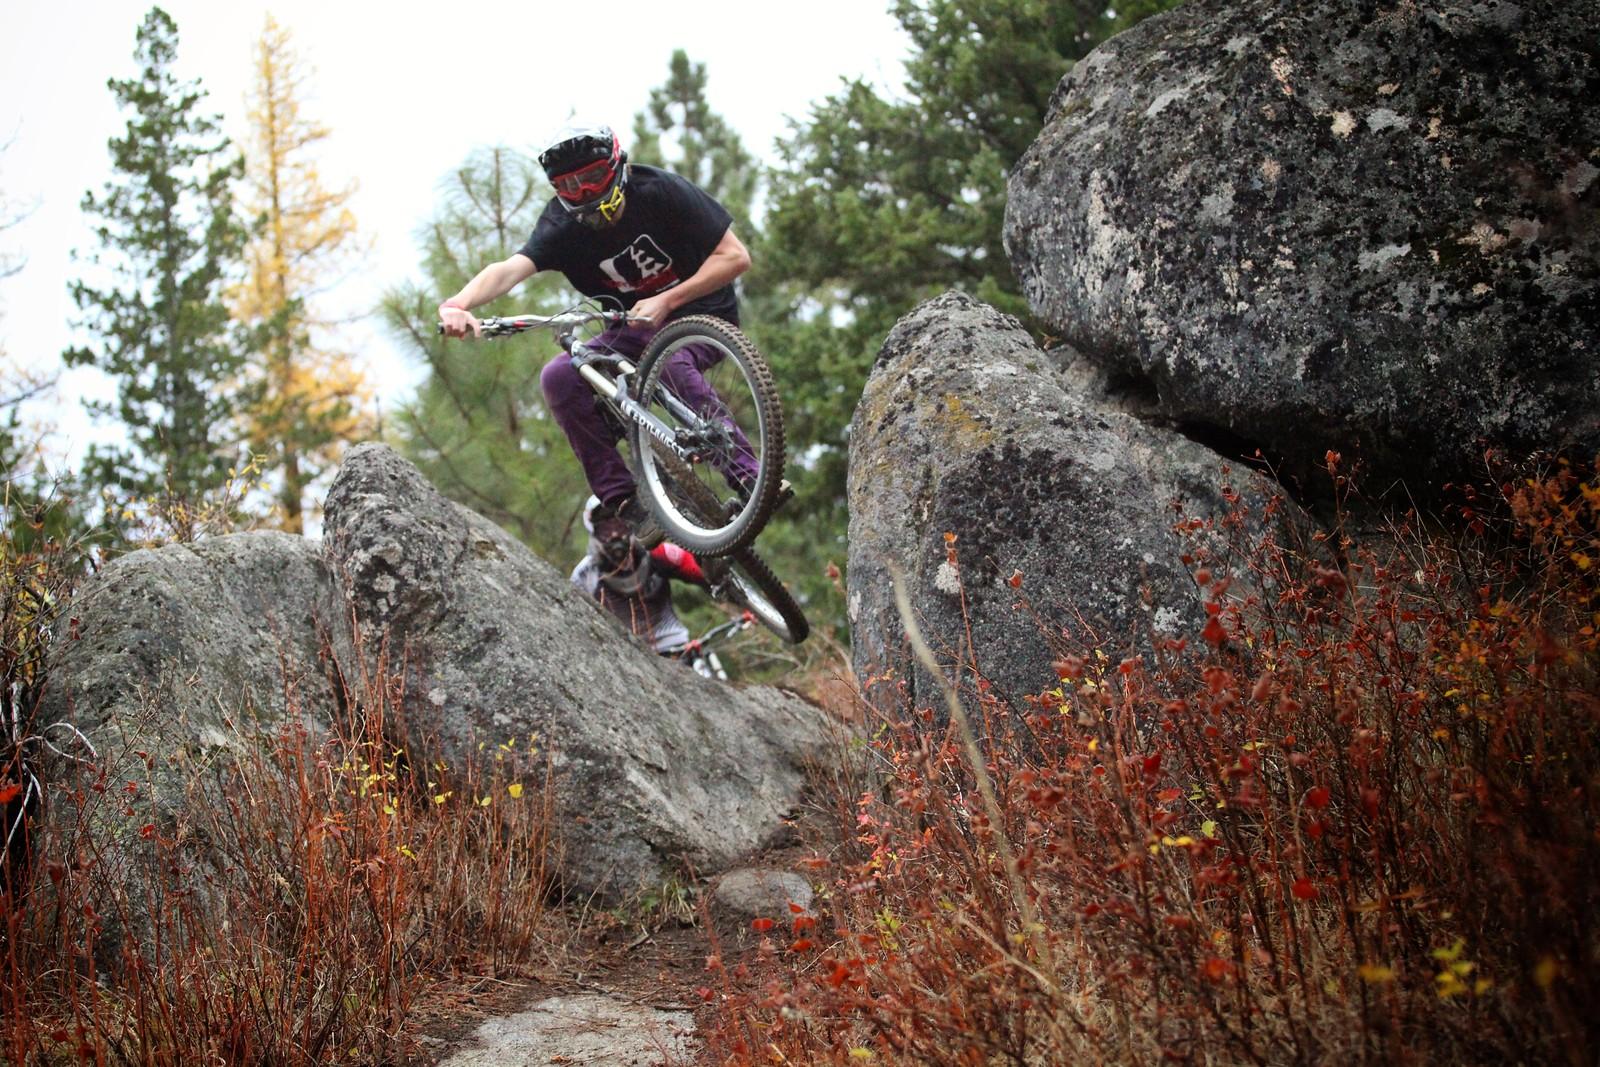 Fall in Idaho - Skye_Schillhammer - Mountain Biking Pictures - Vital MTB